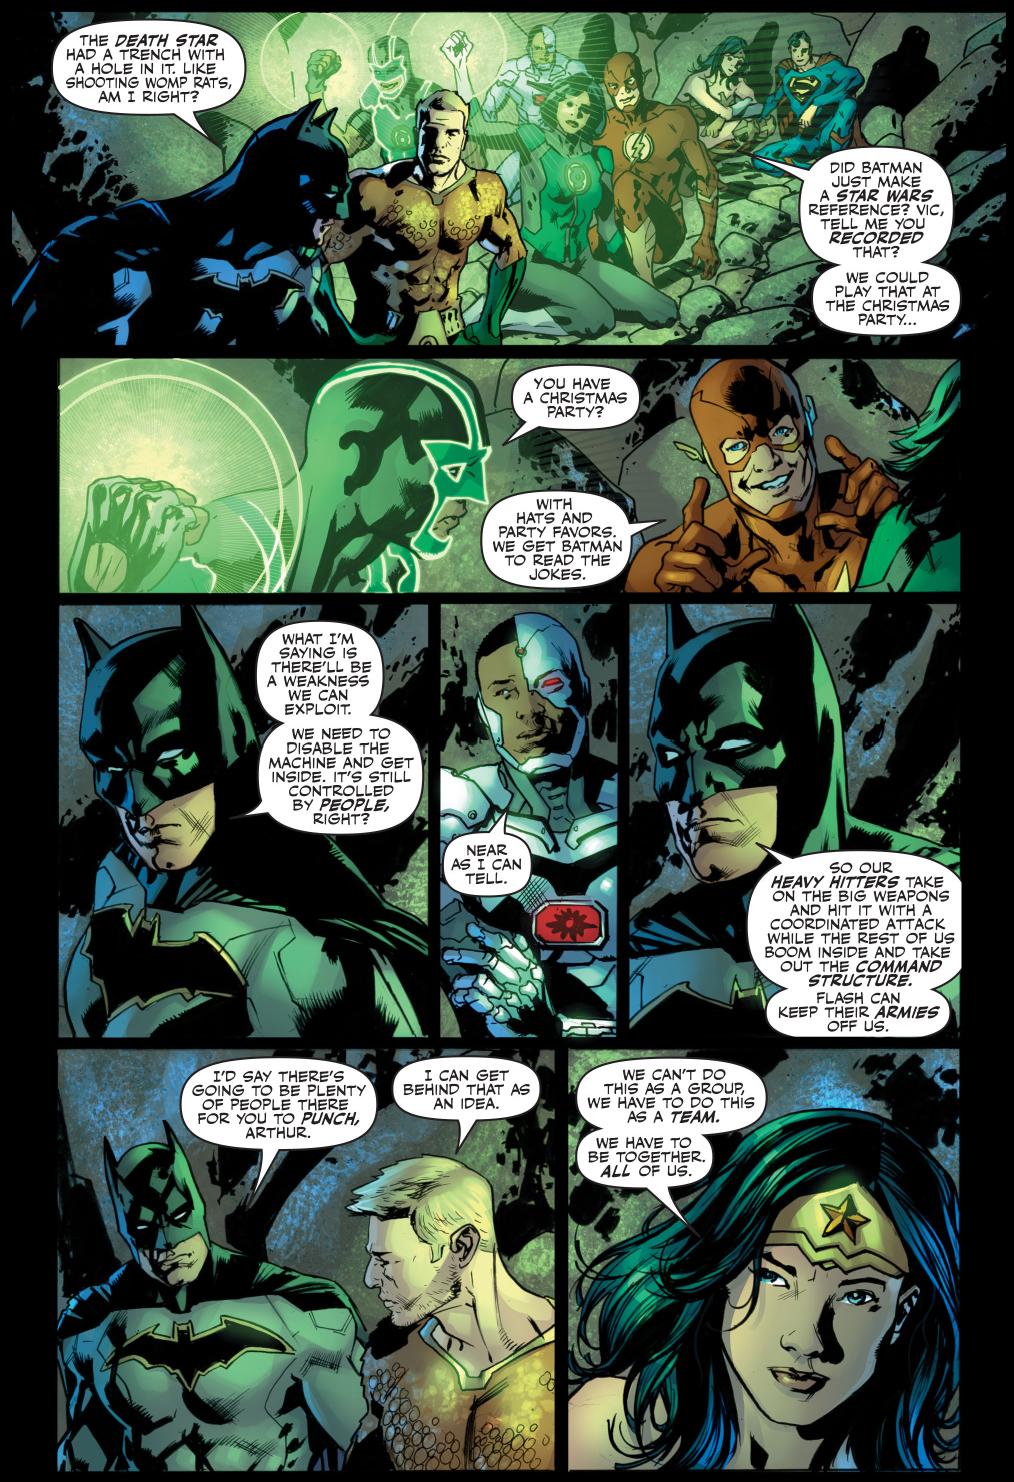 batman-using-a-star-wars-reference